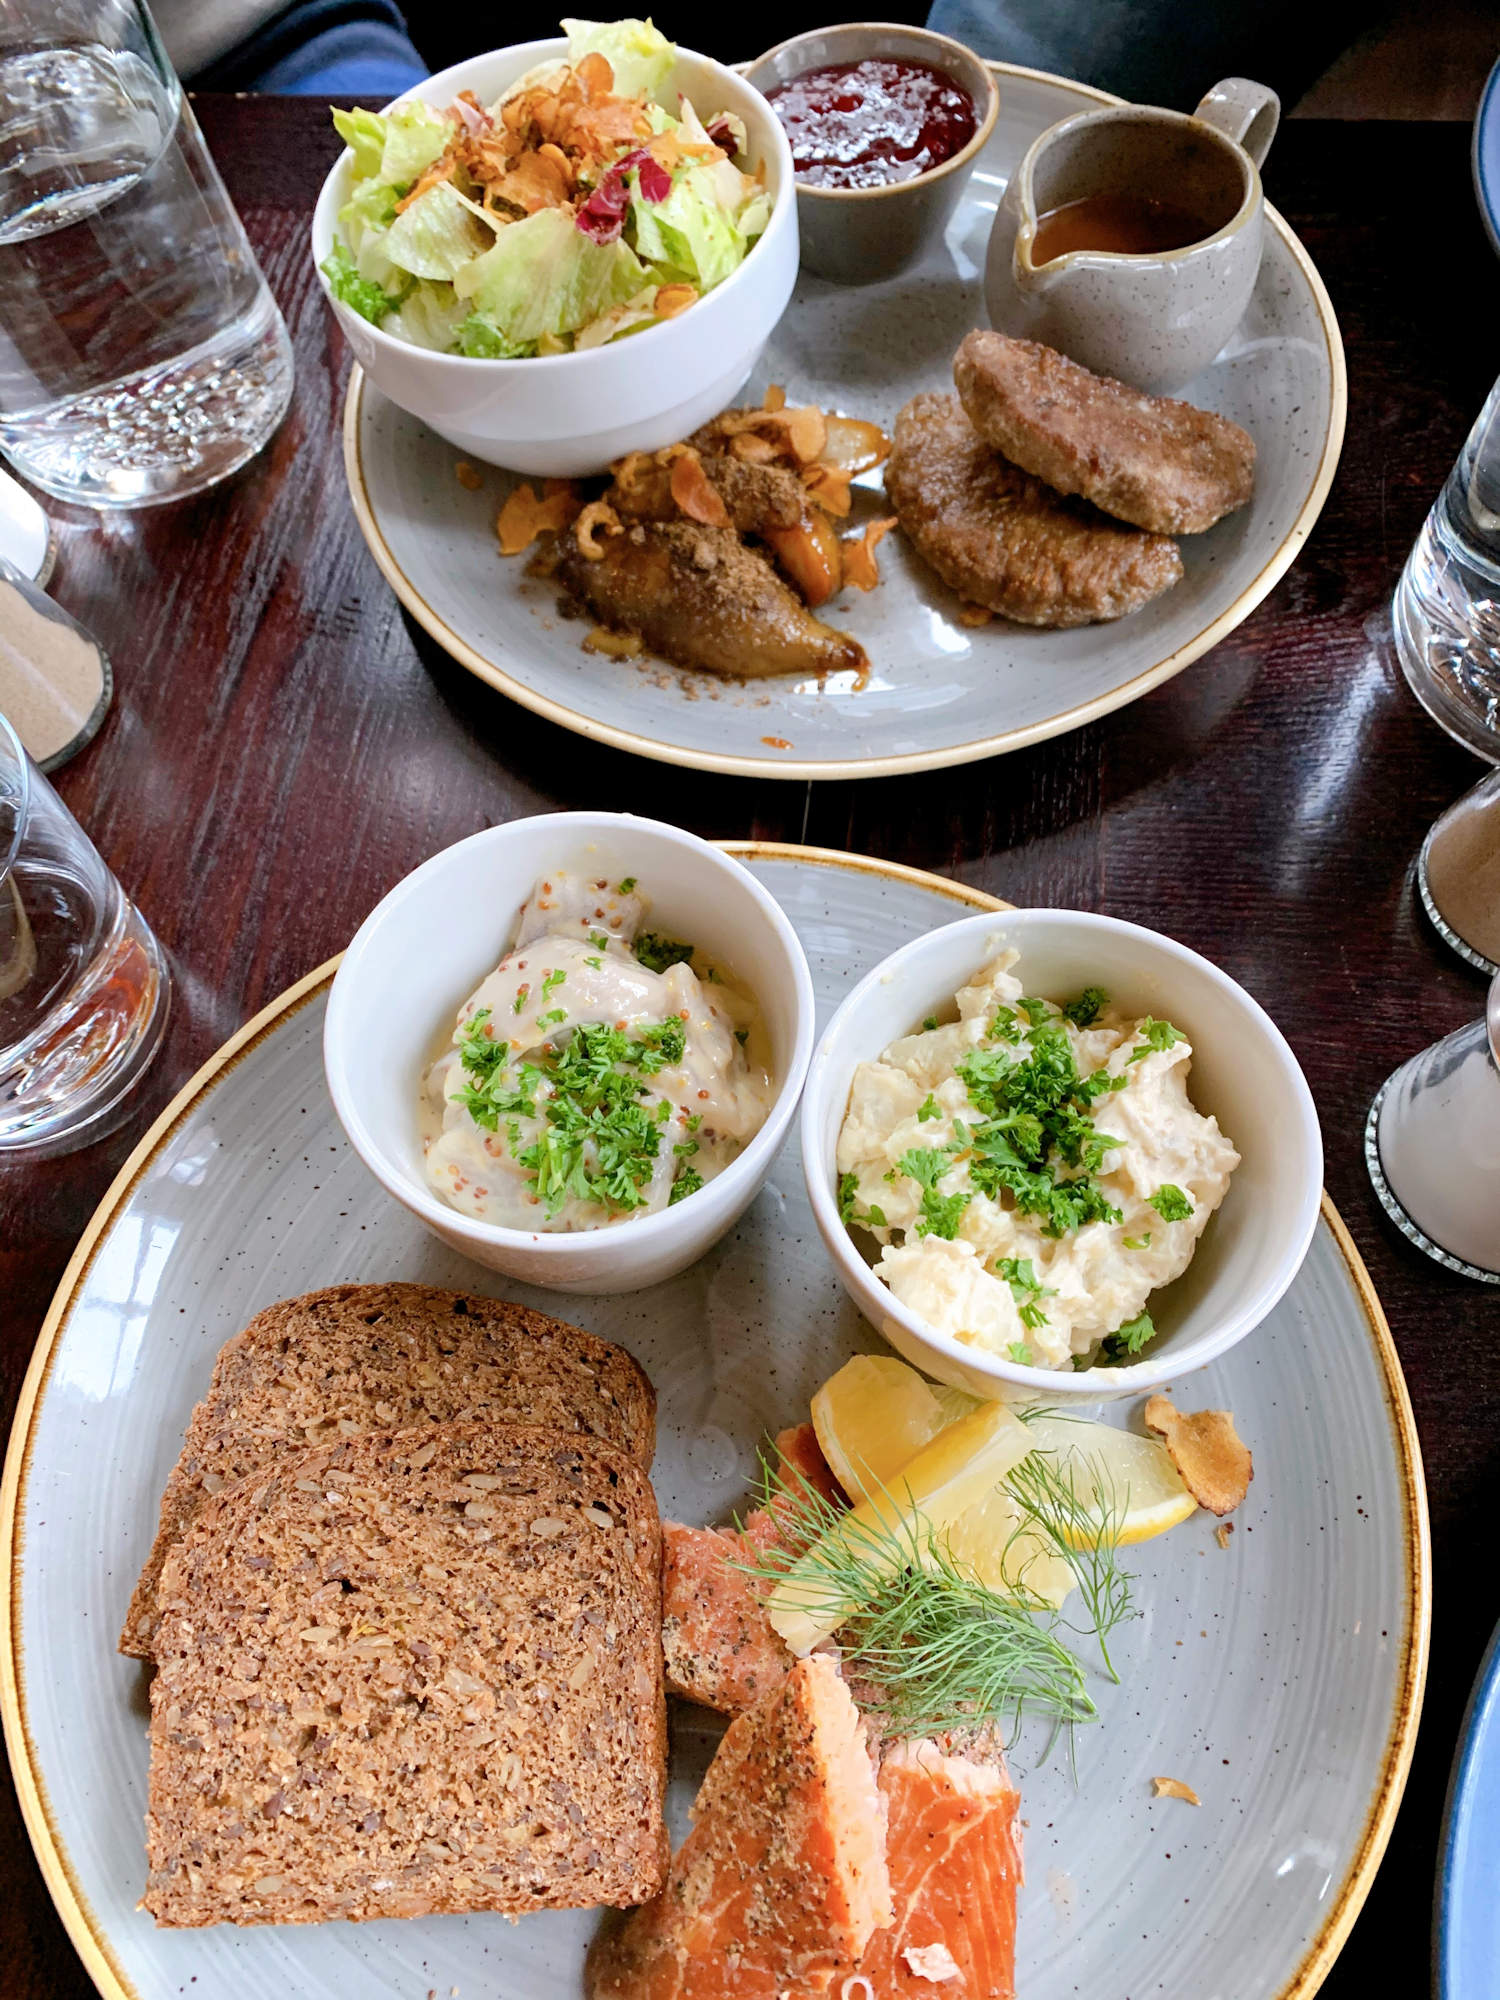 Oslo food tour